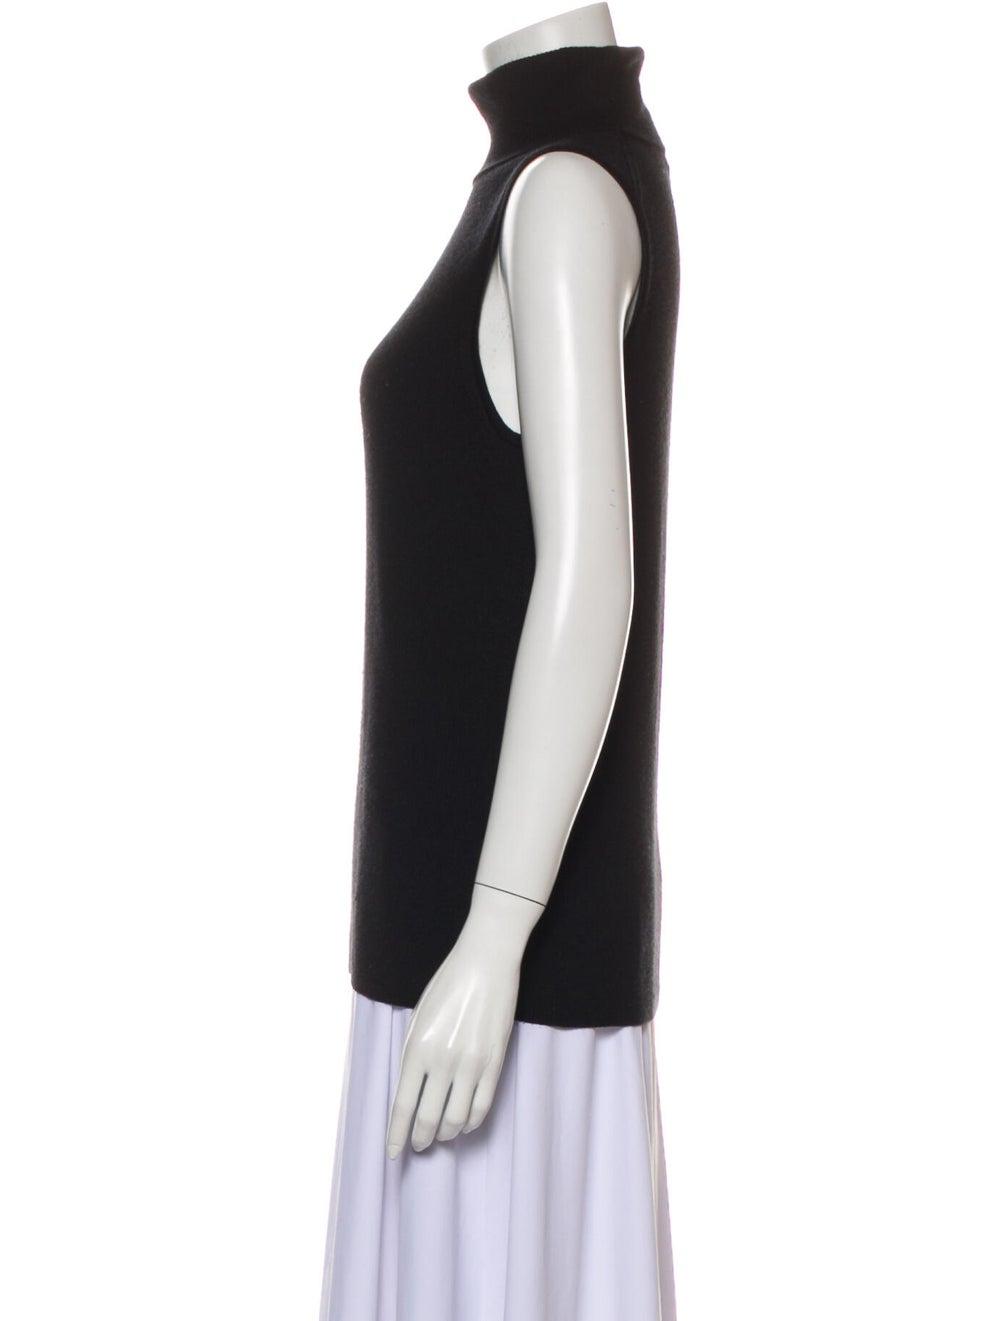 Equipment Silk Turtleneck Sweater Black - image 2